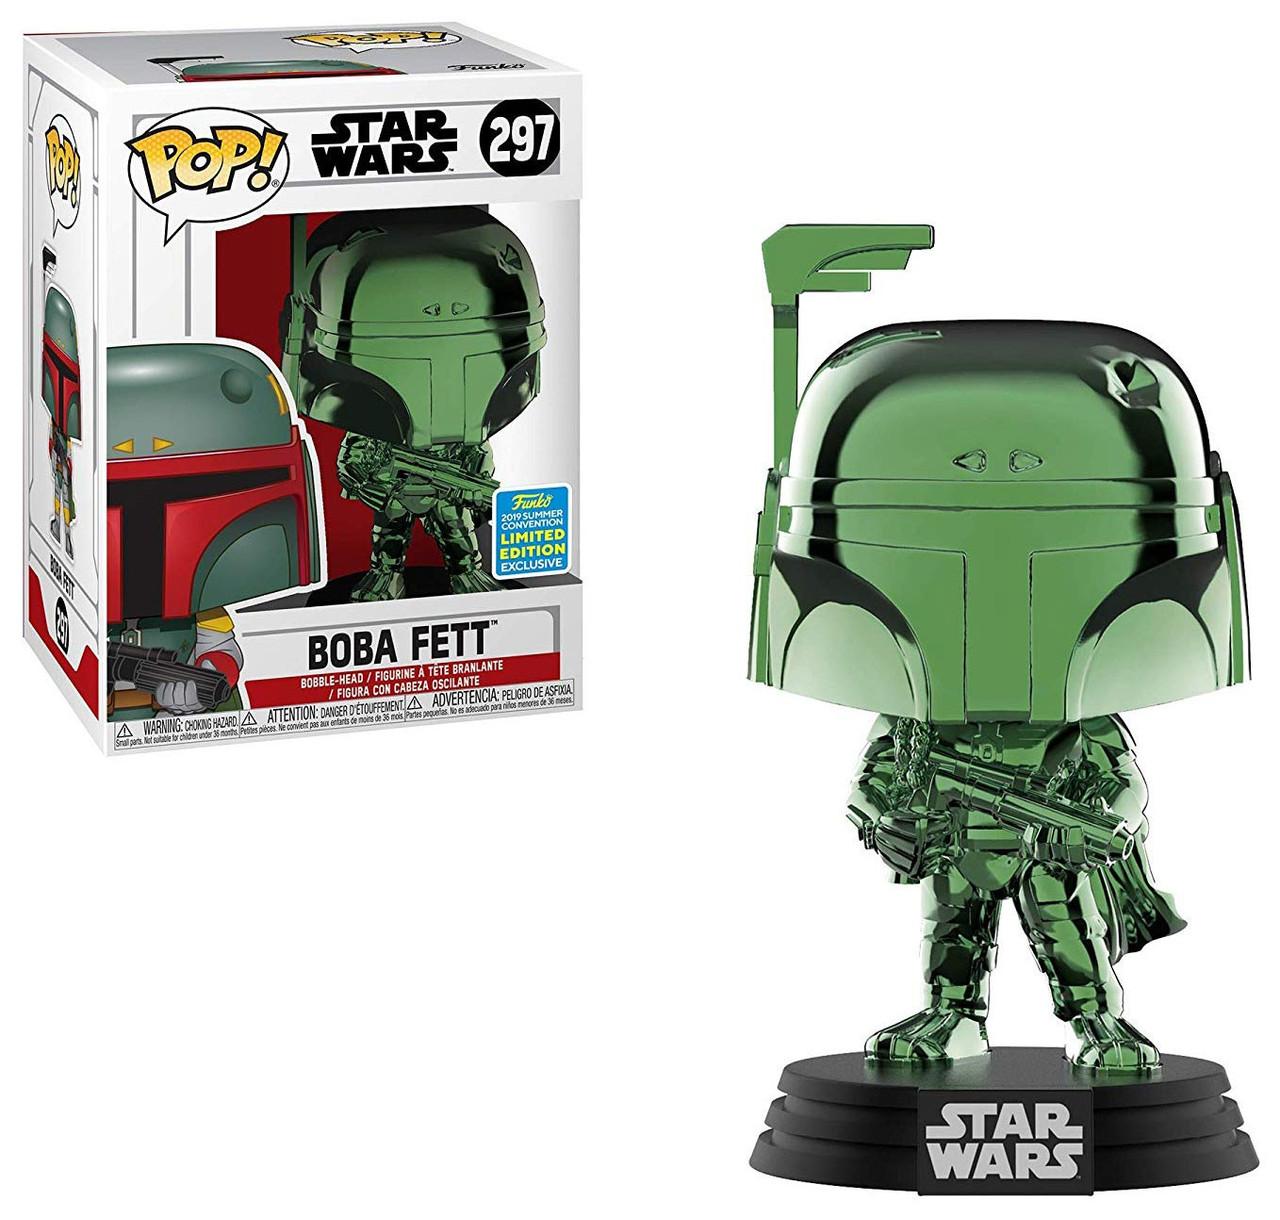 Vinyl Figure Boba Fett 25 cm Mini Figures Funko Star Wars Super Sized Pop